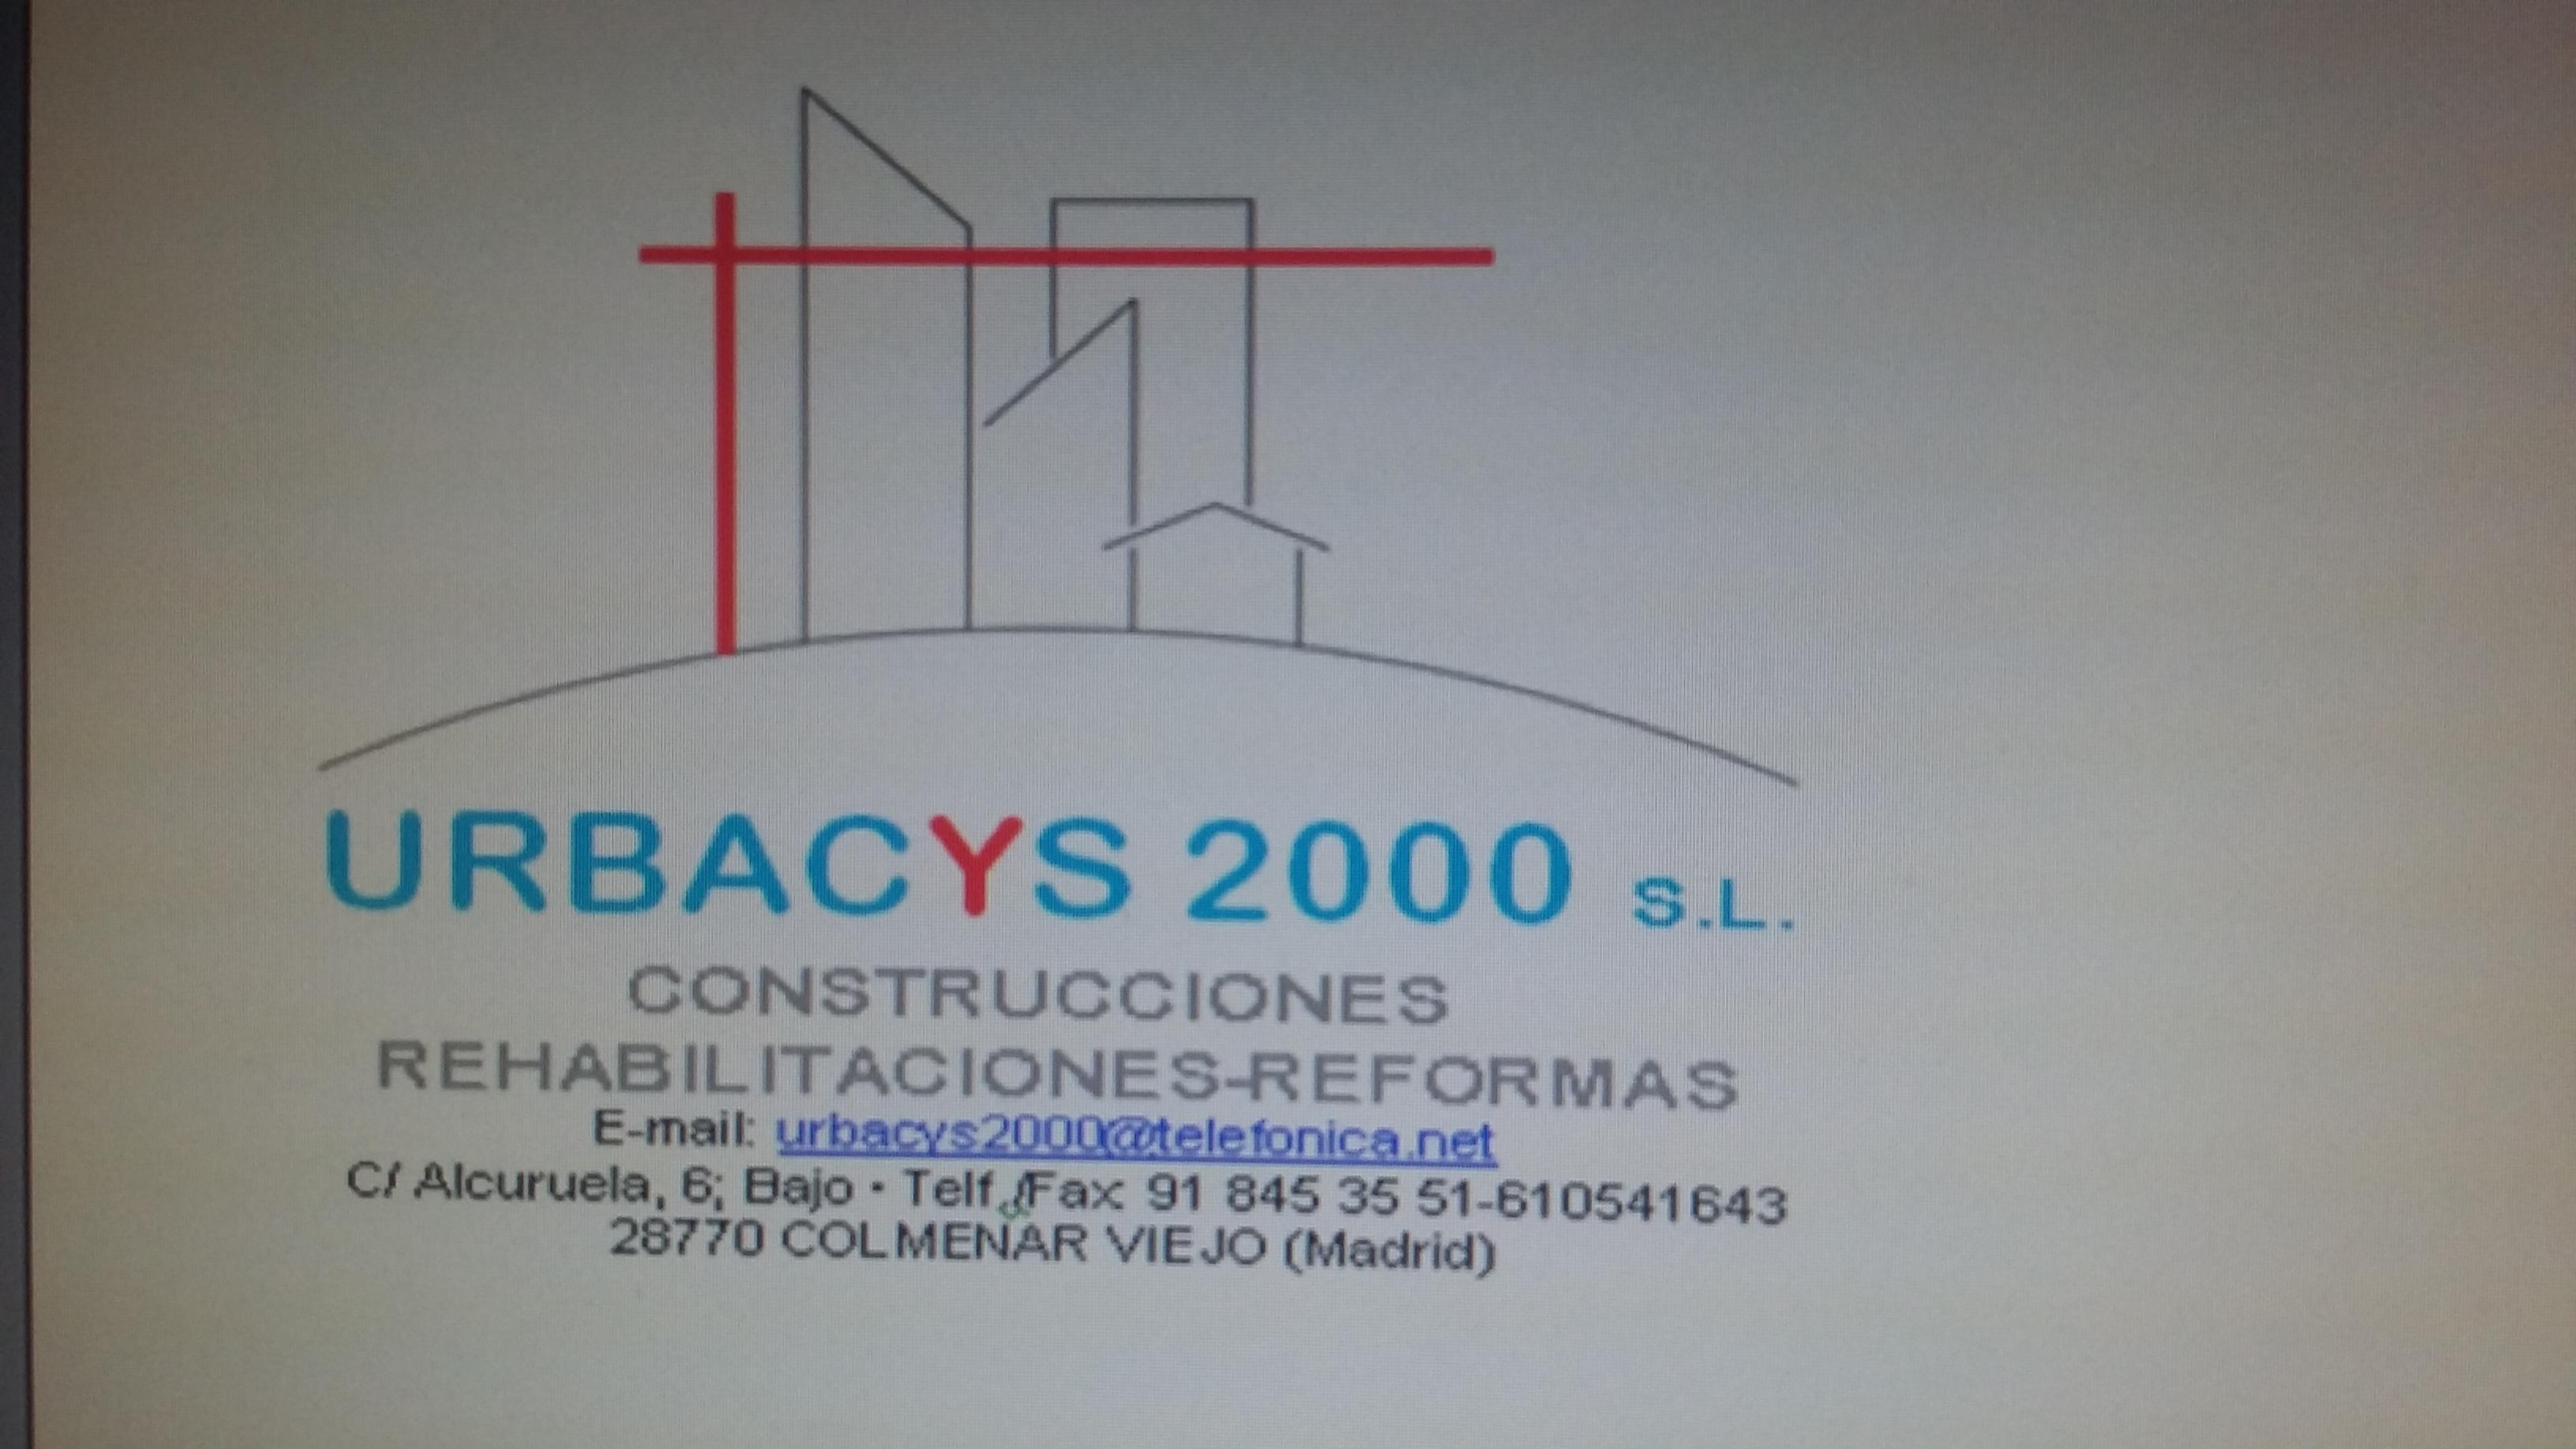 Urbacys 2000 SL